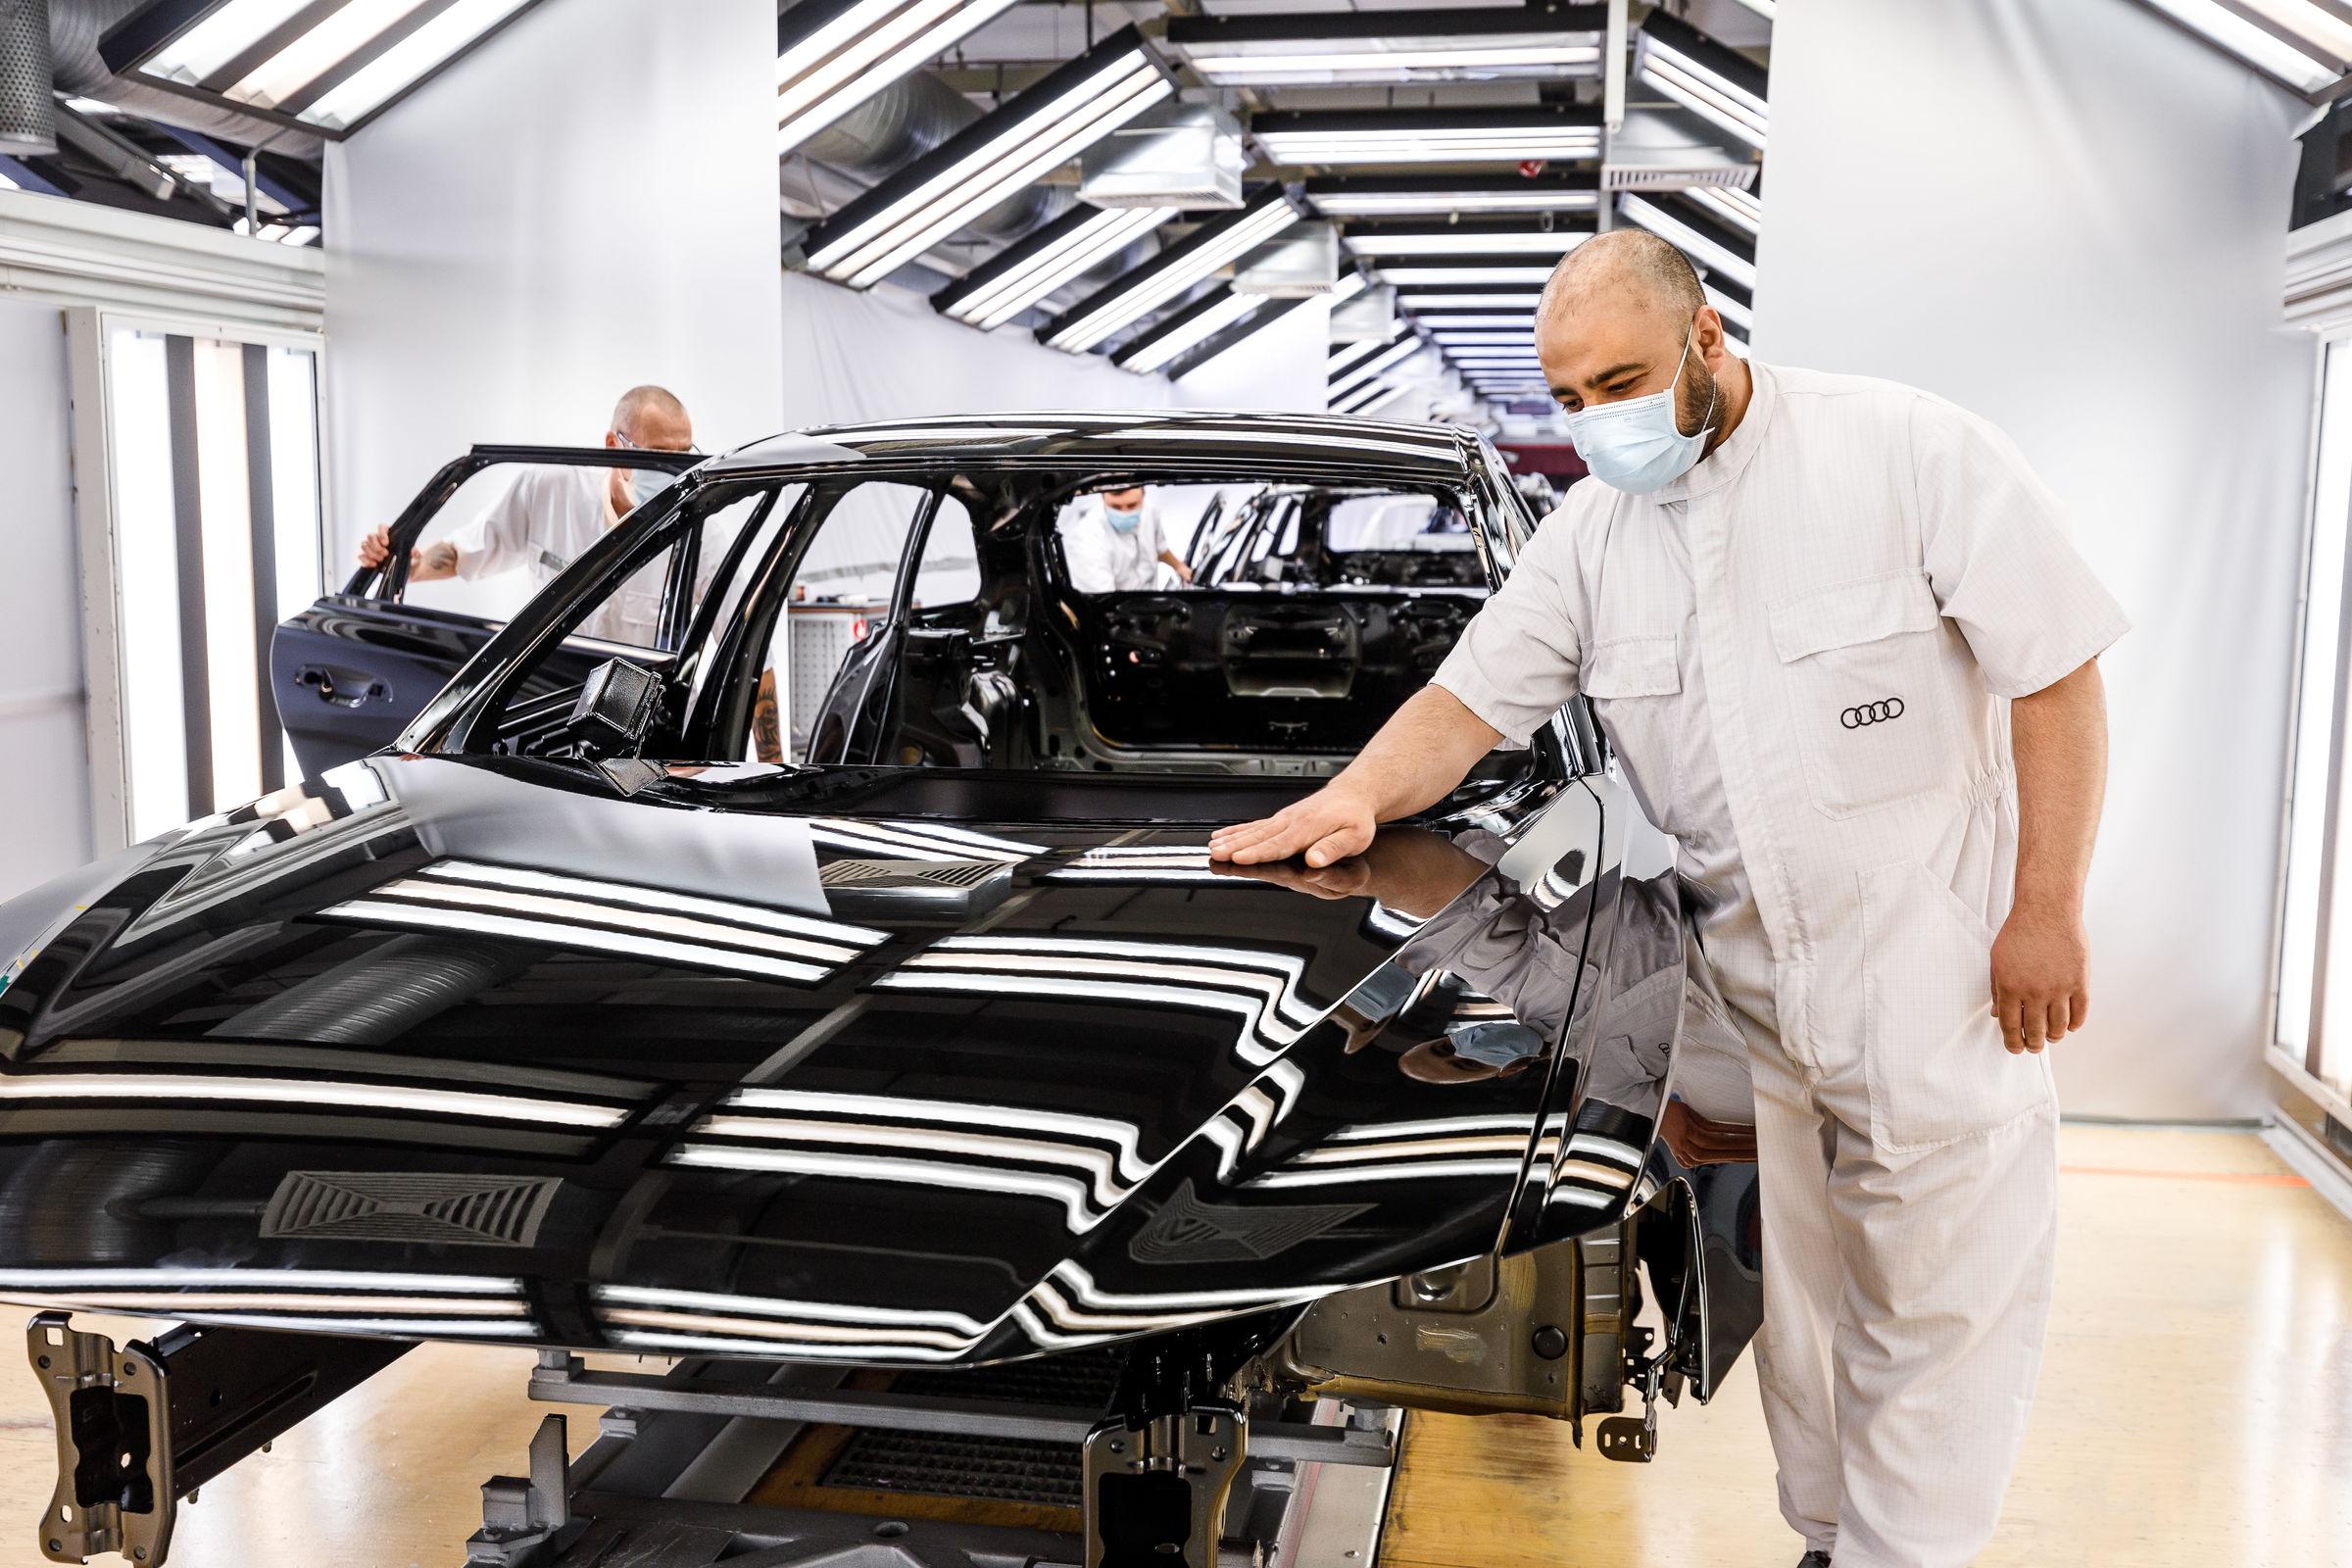 Fahrzeugproduktion am Audi-Standort Neckarsulm läuft wieder an